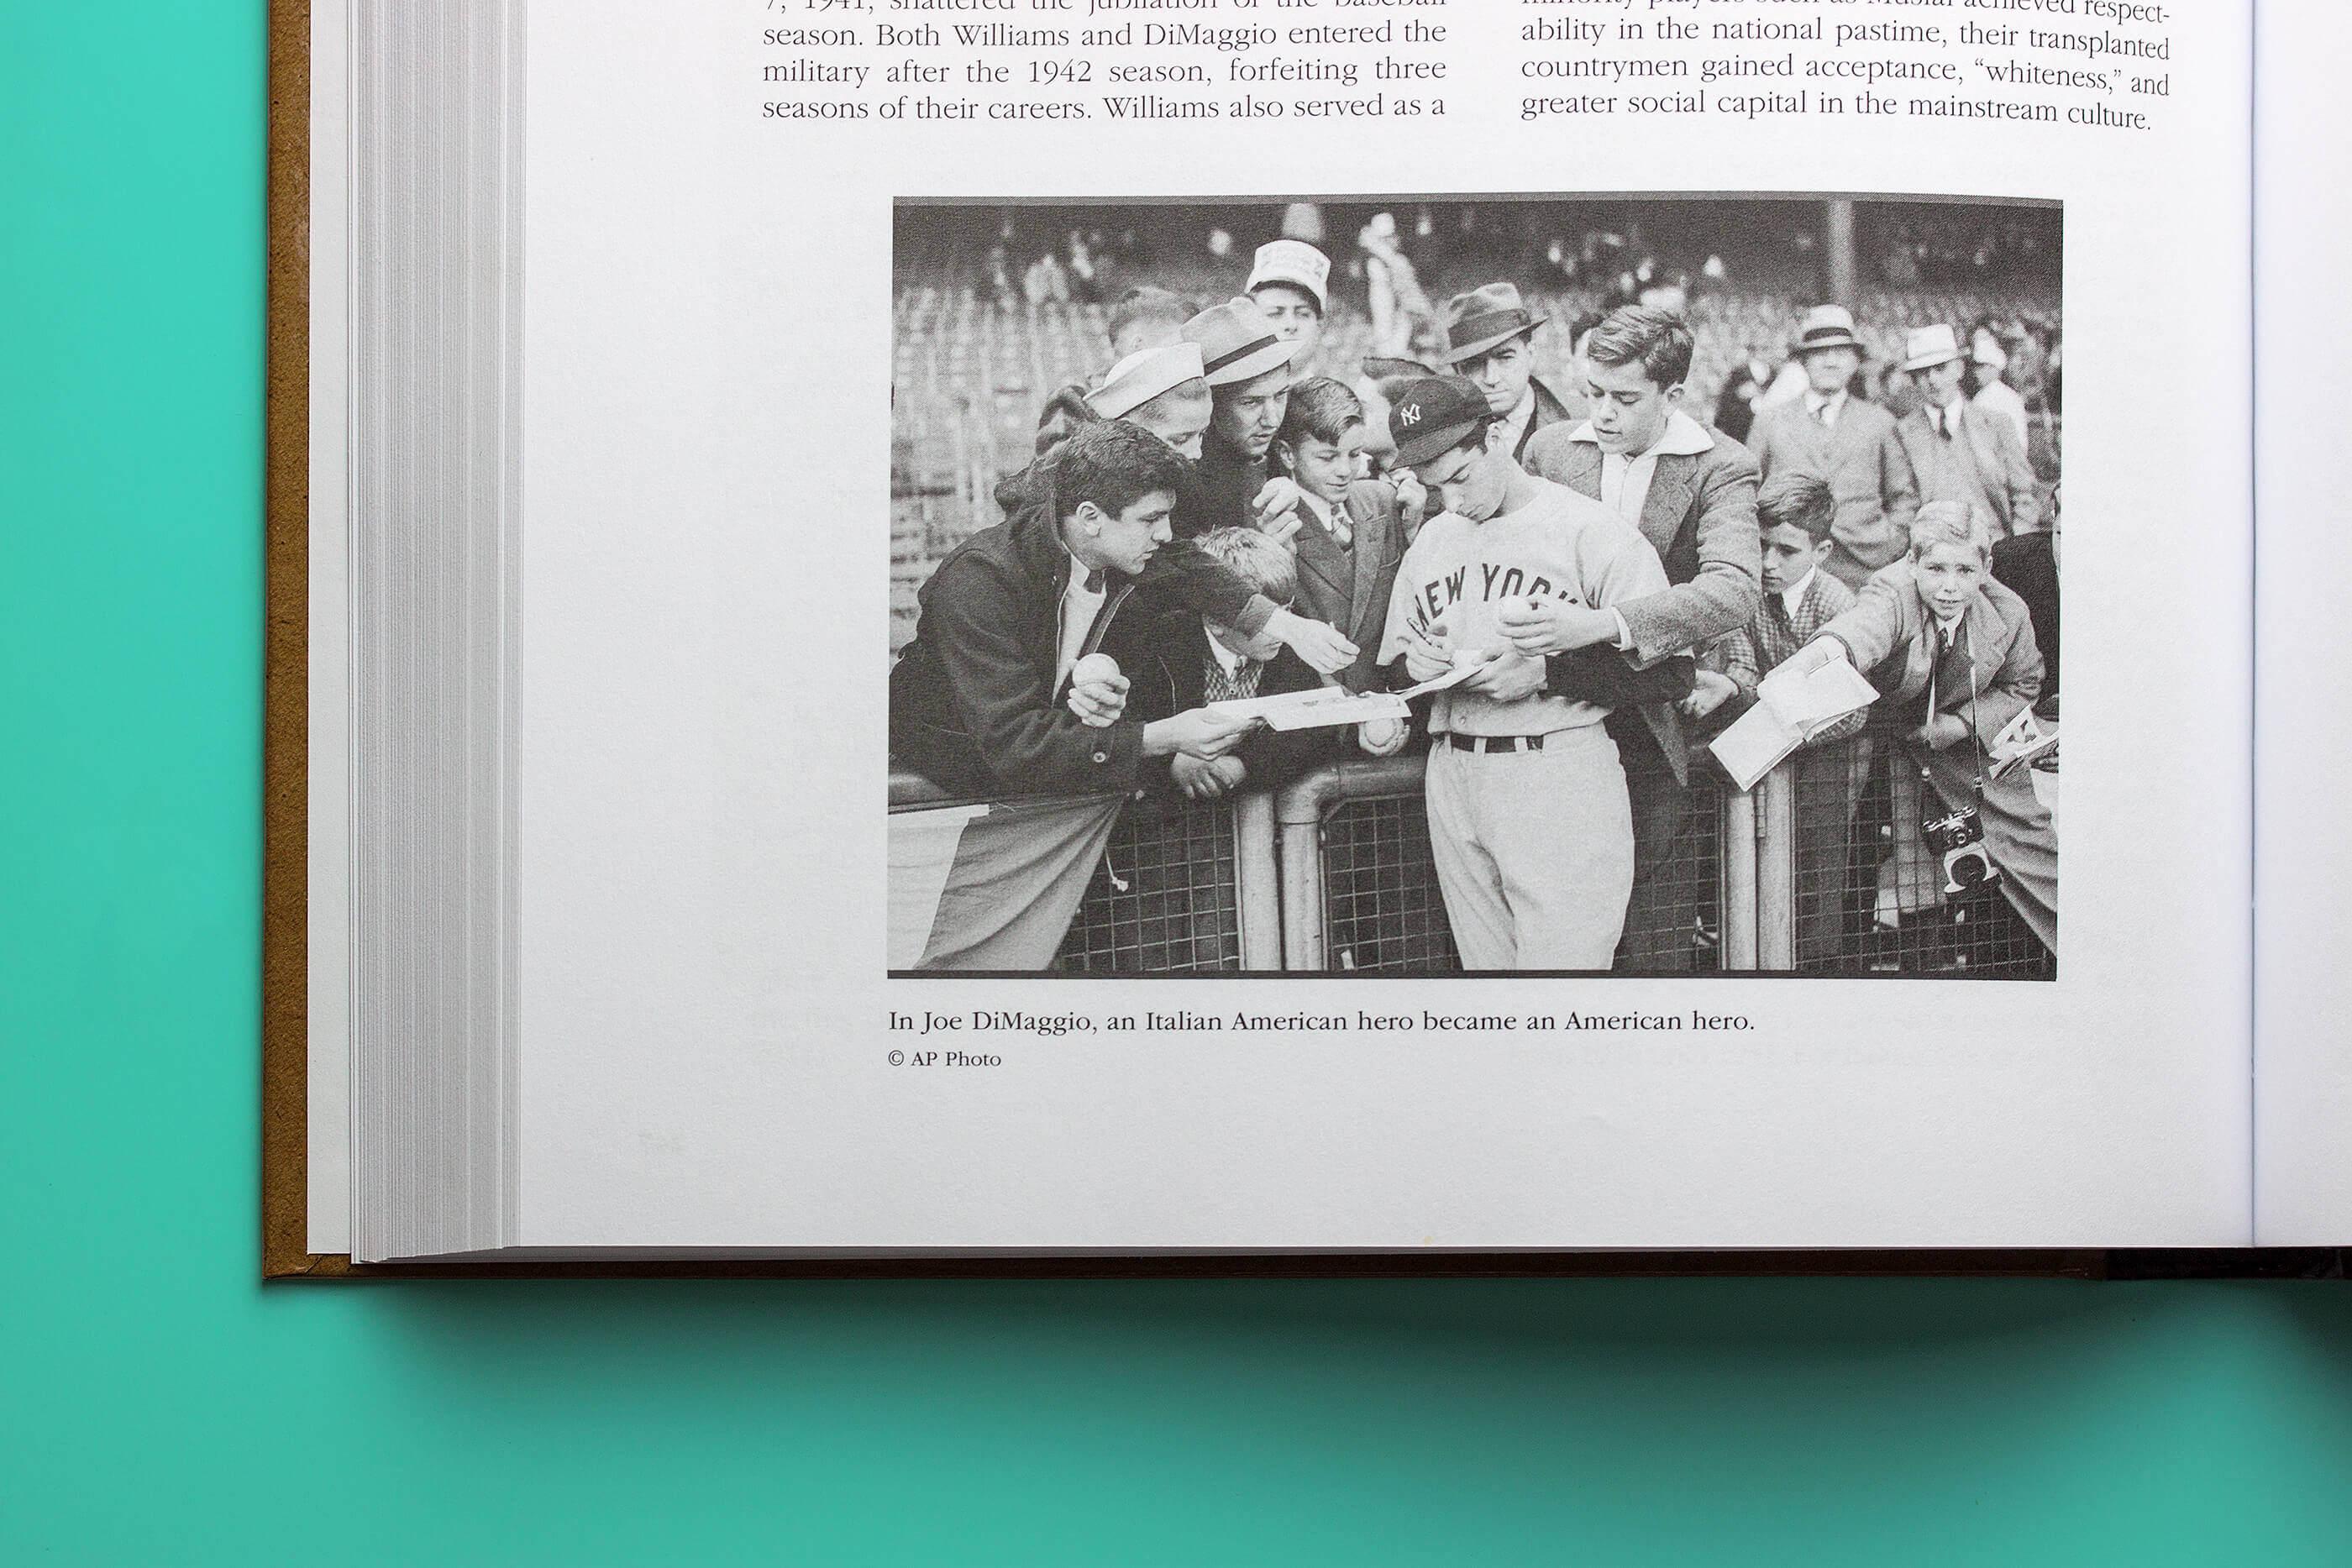 American baseball hero Joe DiMaggio signs autographs